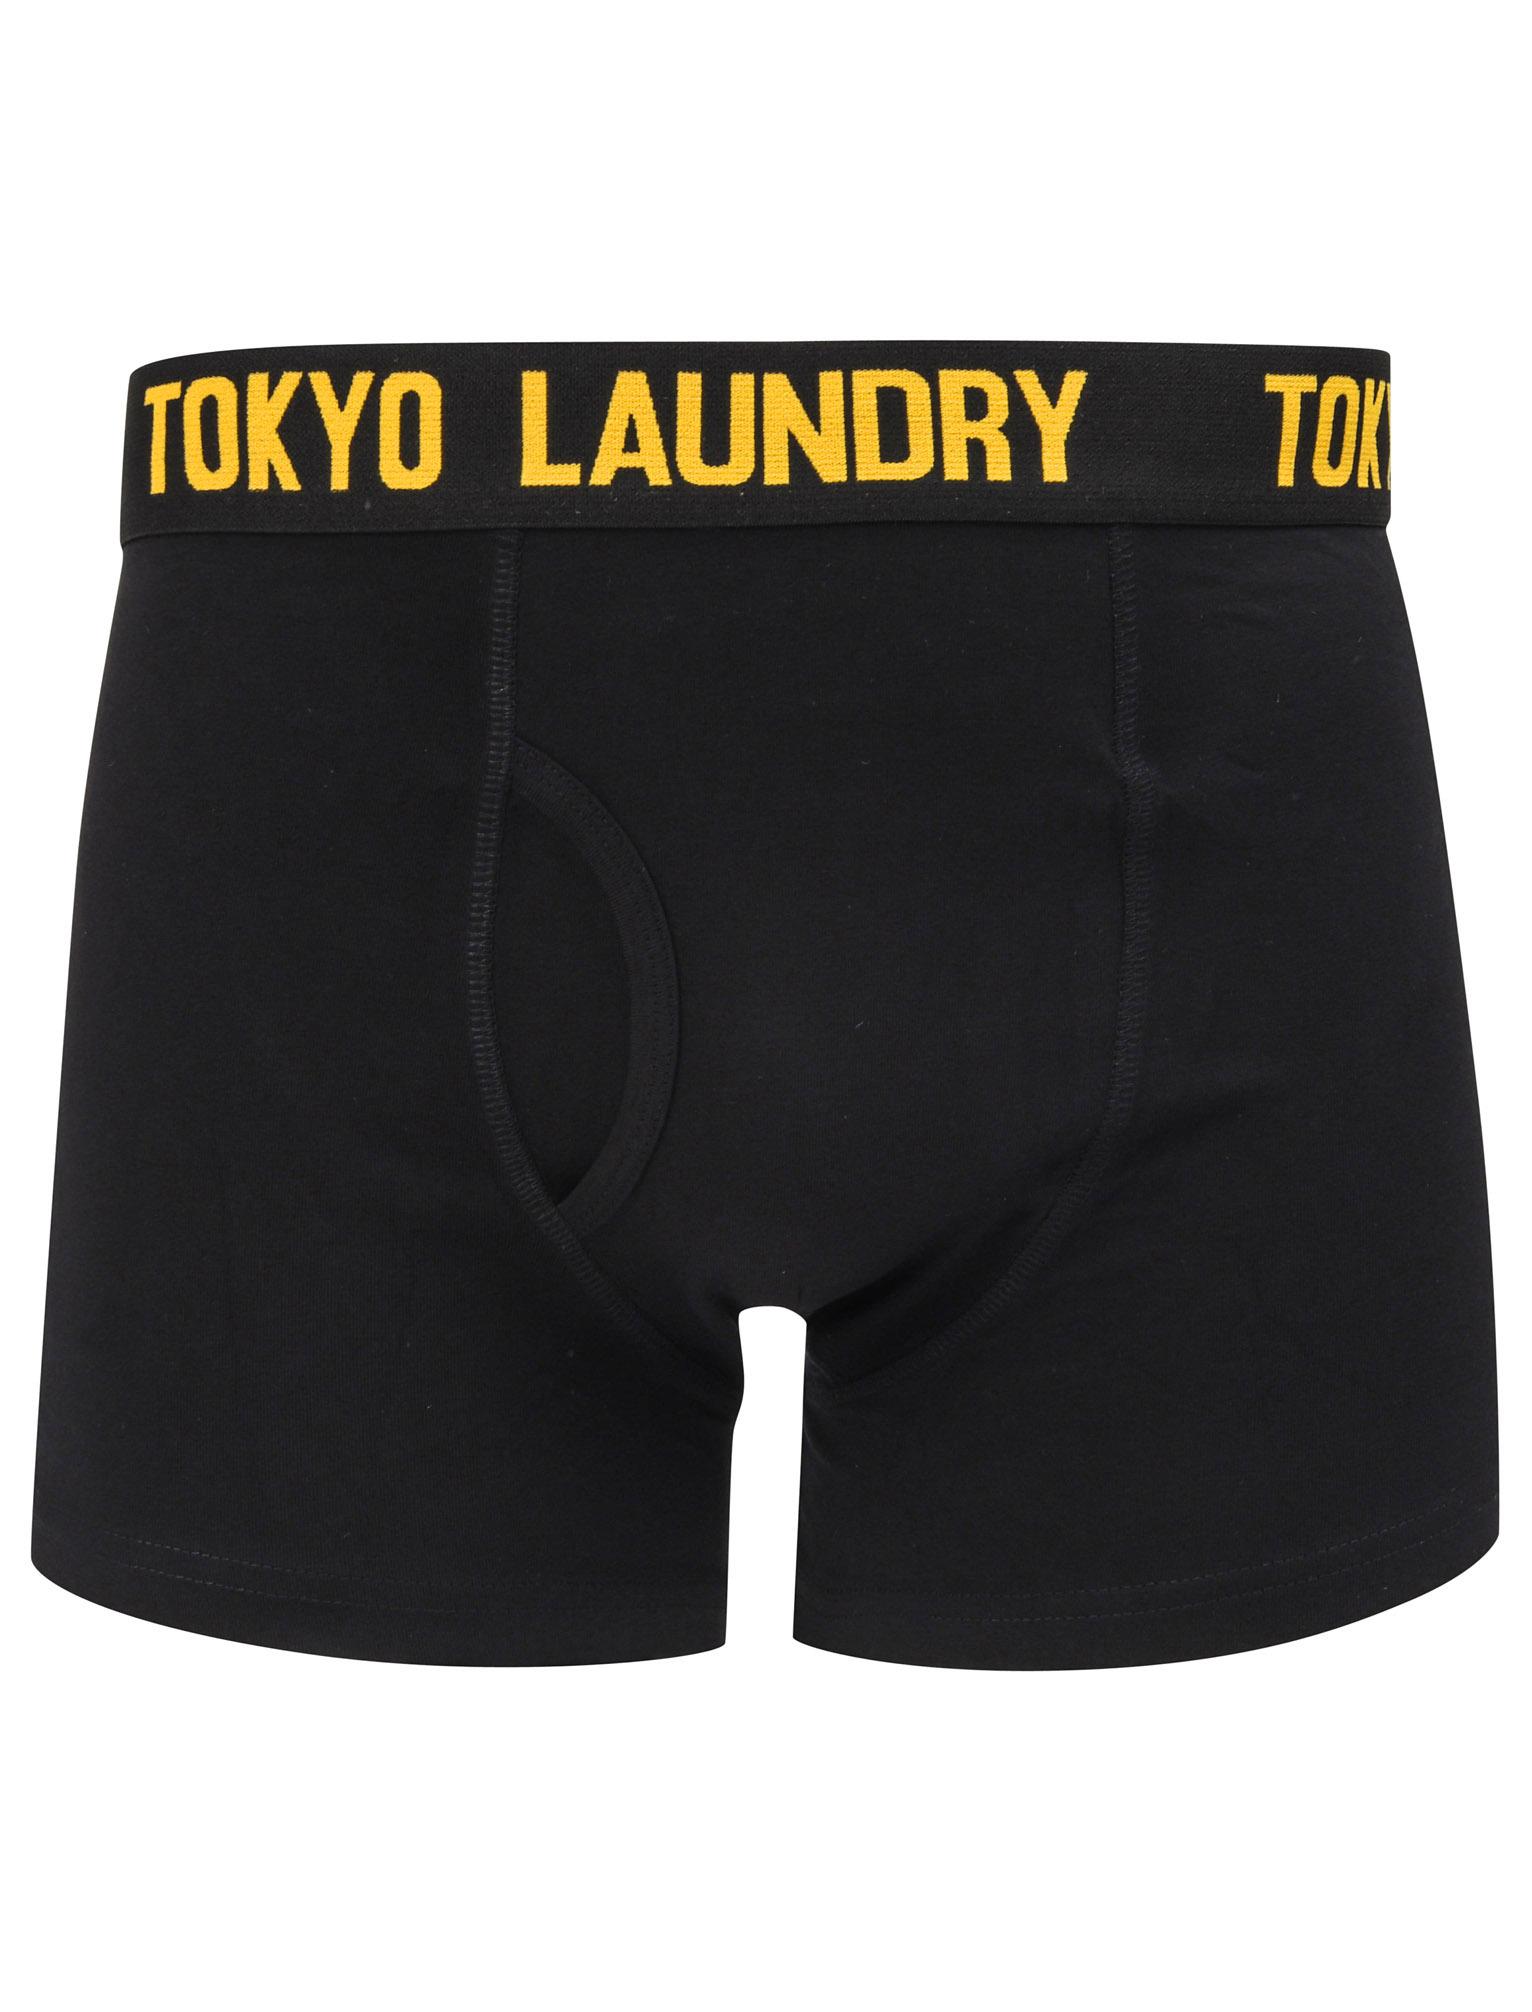 New-Mens-Tokyo-Laundry-2-Pack-Cotton-Rich-Boxer-Shorts-Set-Trunks-Size-S-XXL thumbnail 80